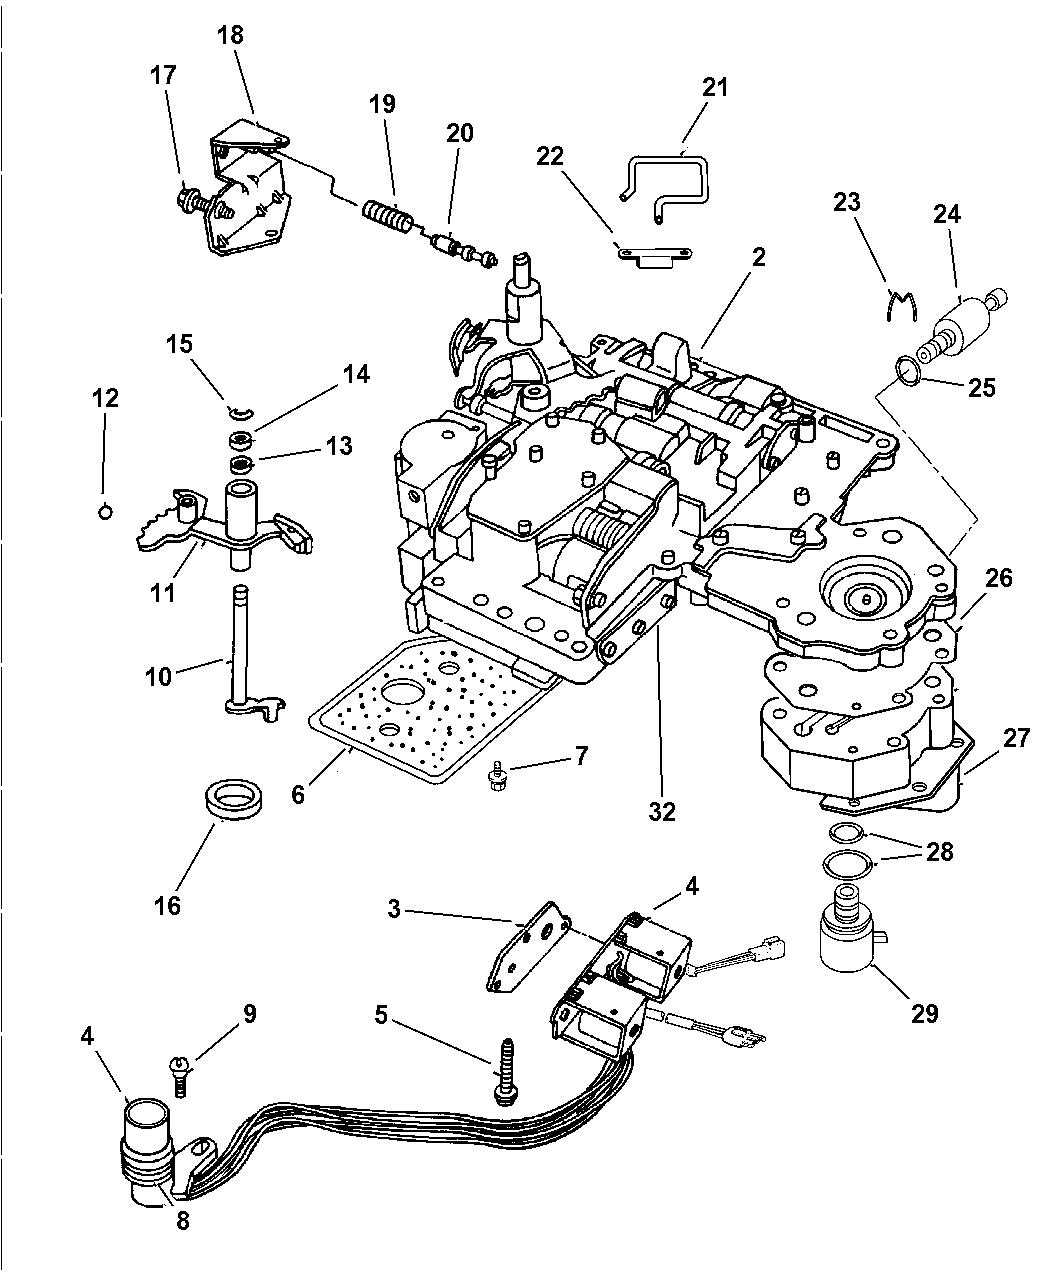 2001 dodge ram 1500 regular cab valve body - thumbnail 1